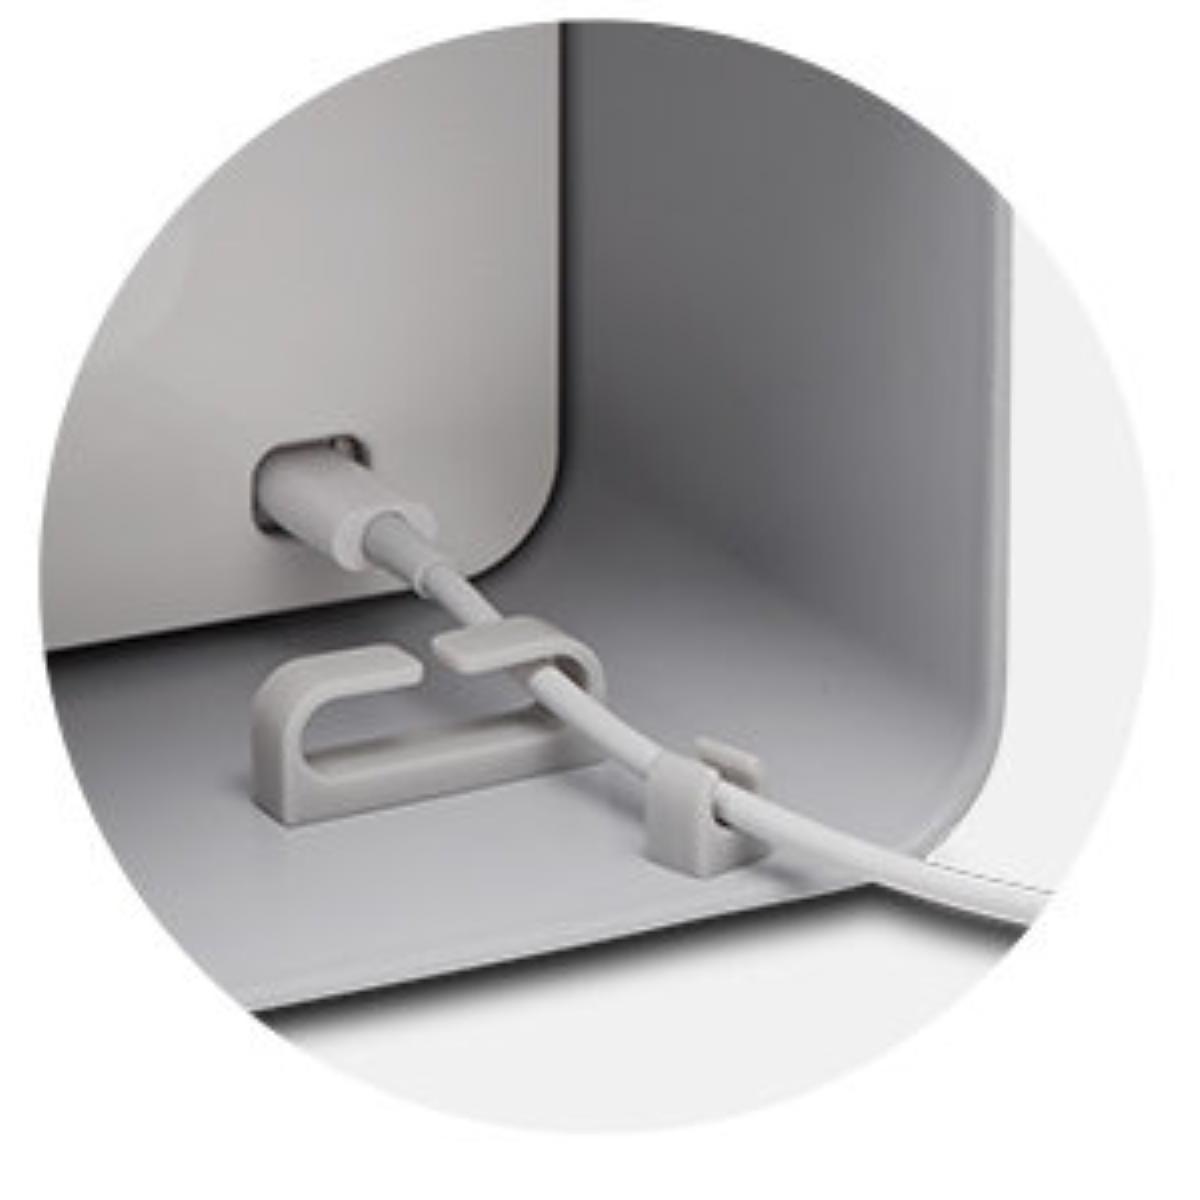 FreshView Air Purifier - Cable Management System